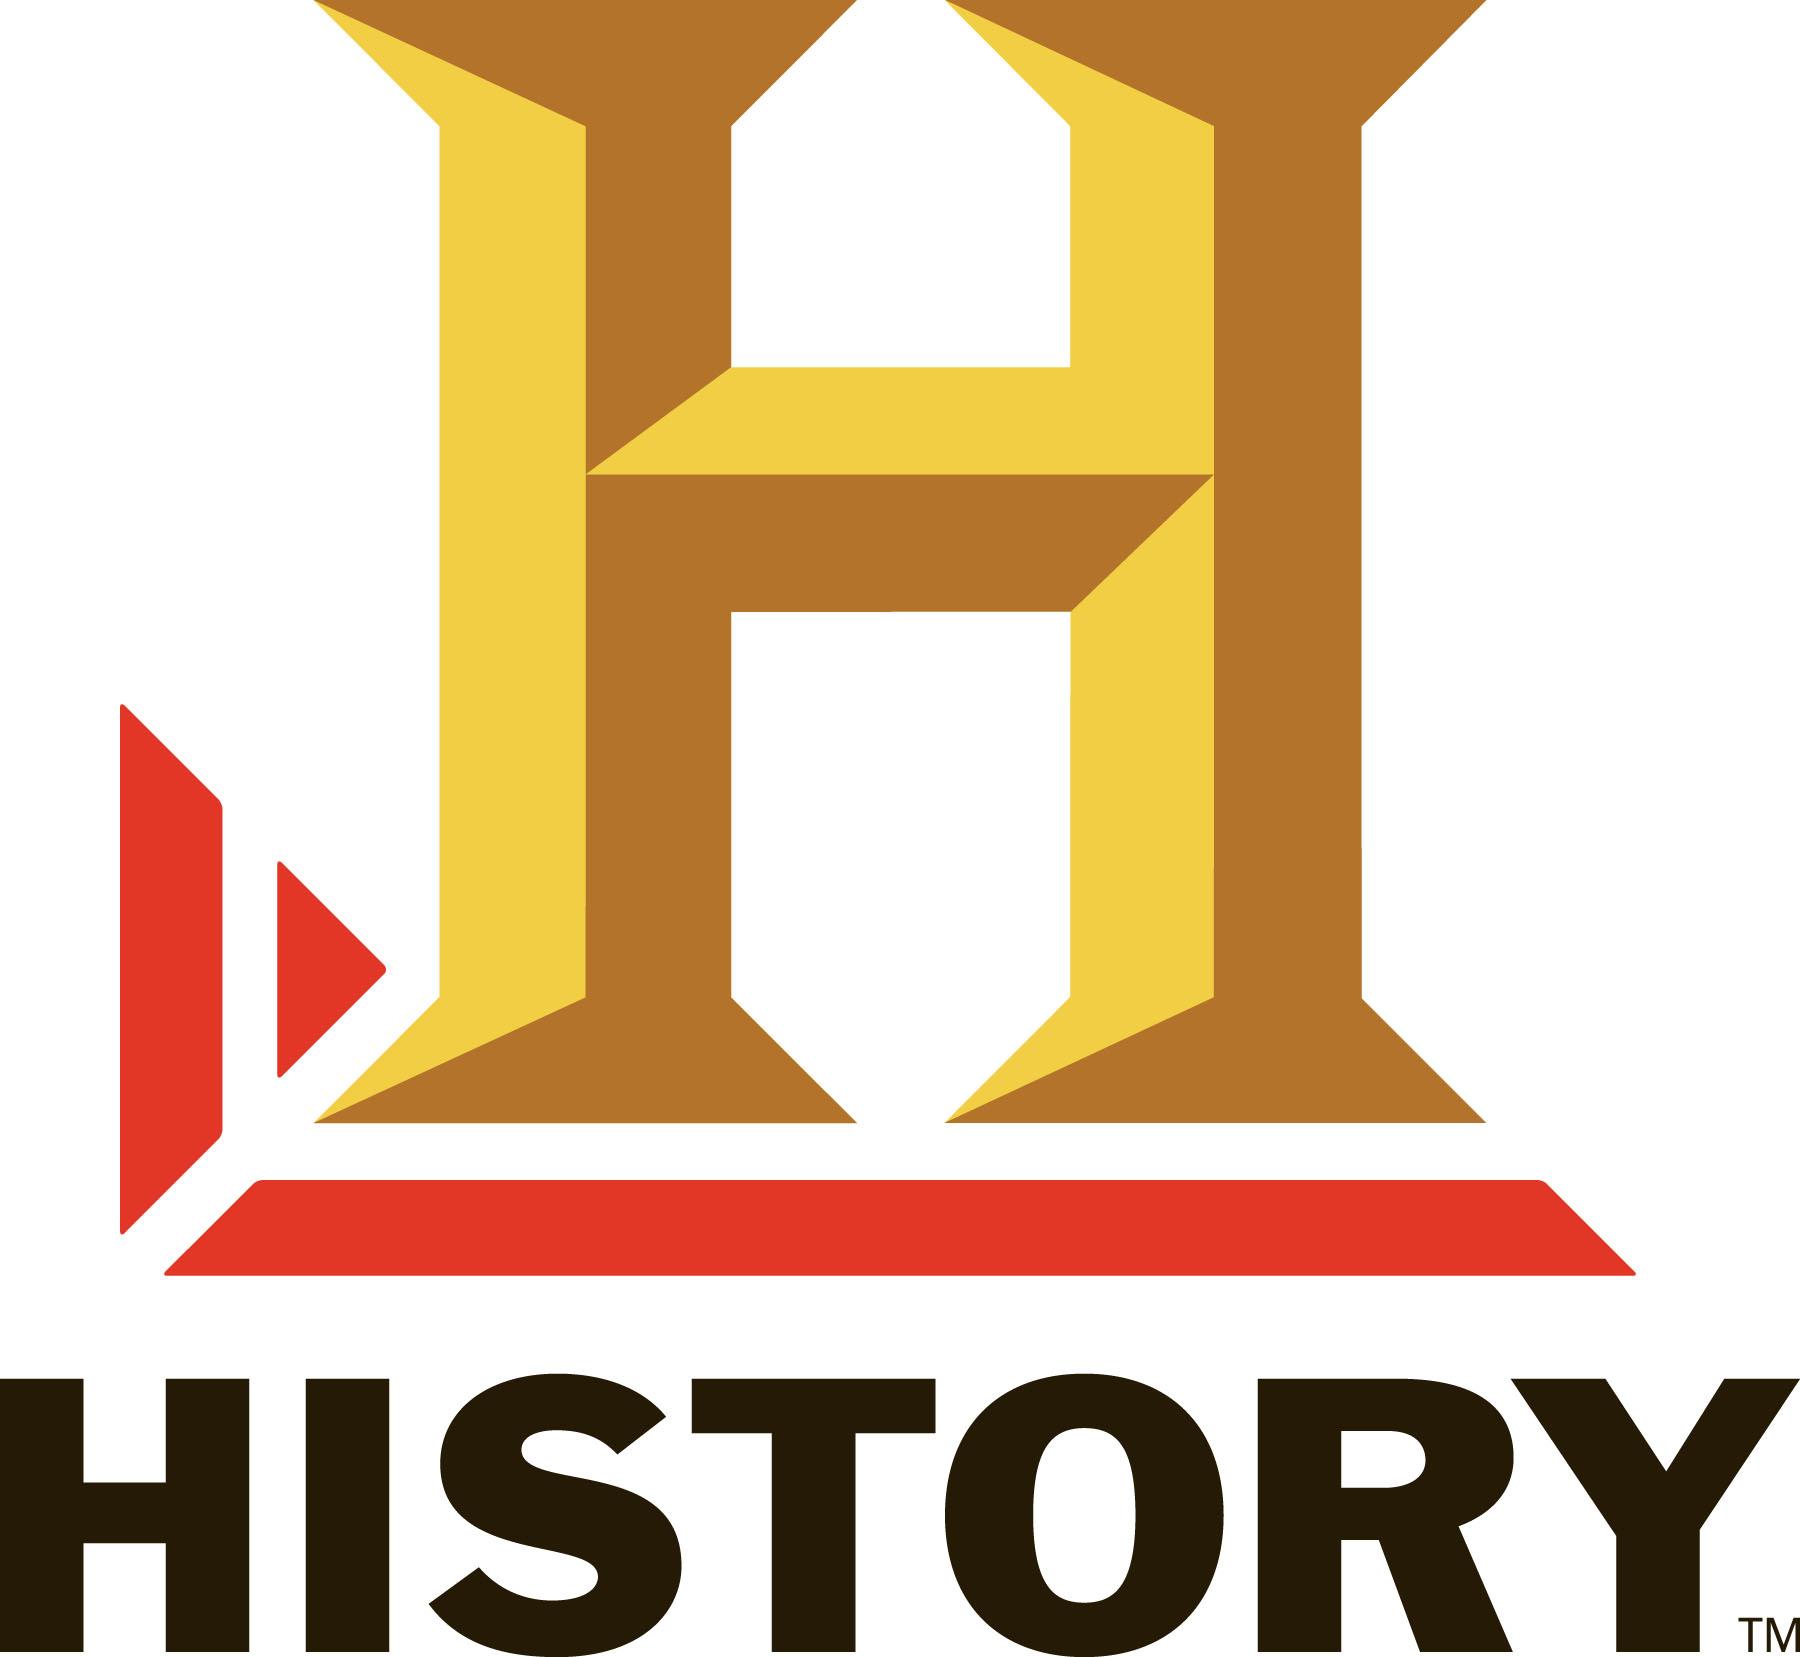 HISTORY™